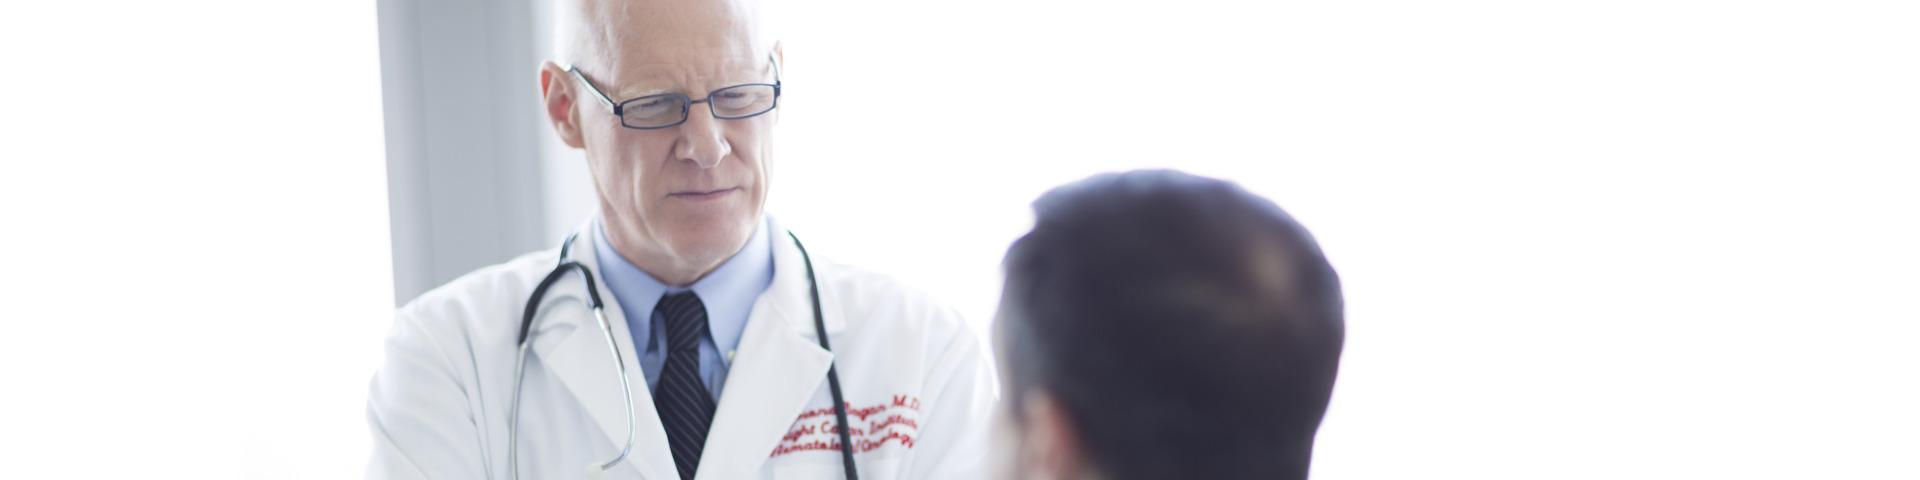 OHSU Knight Cancer Treamtment Dr Bergan_1.jpg